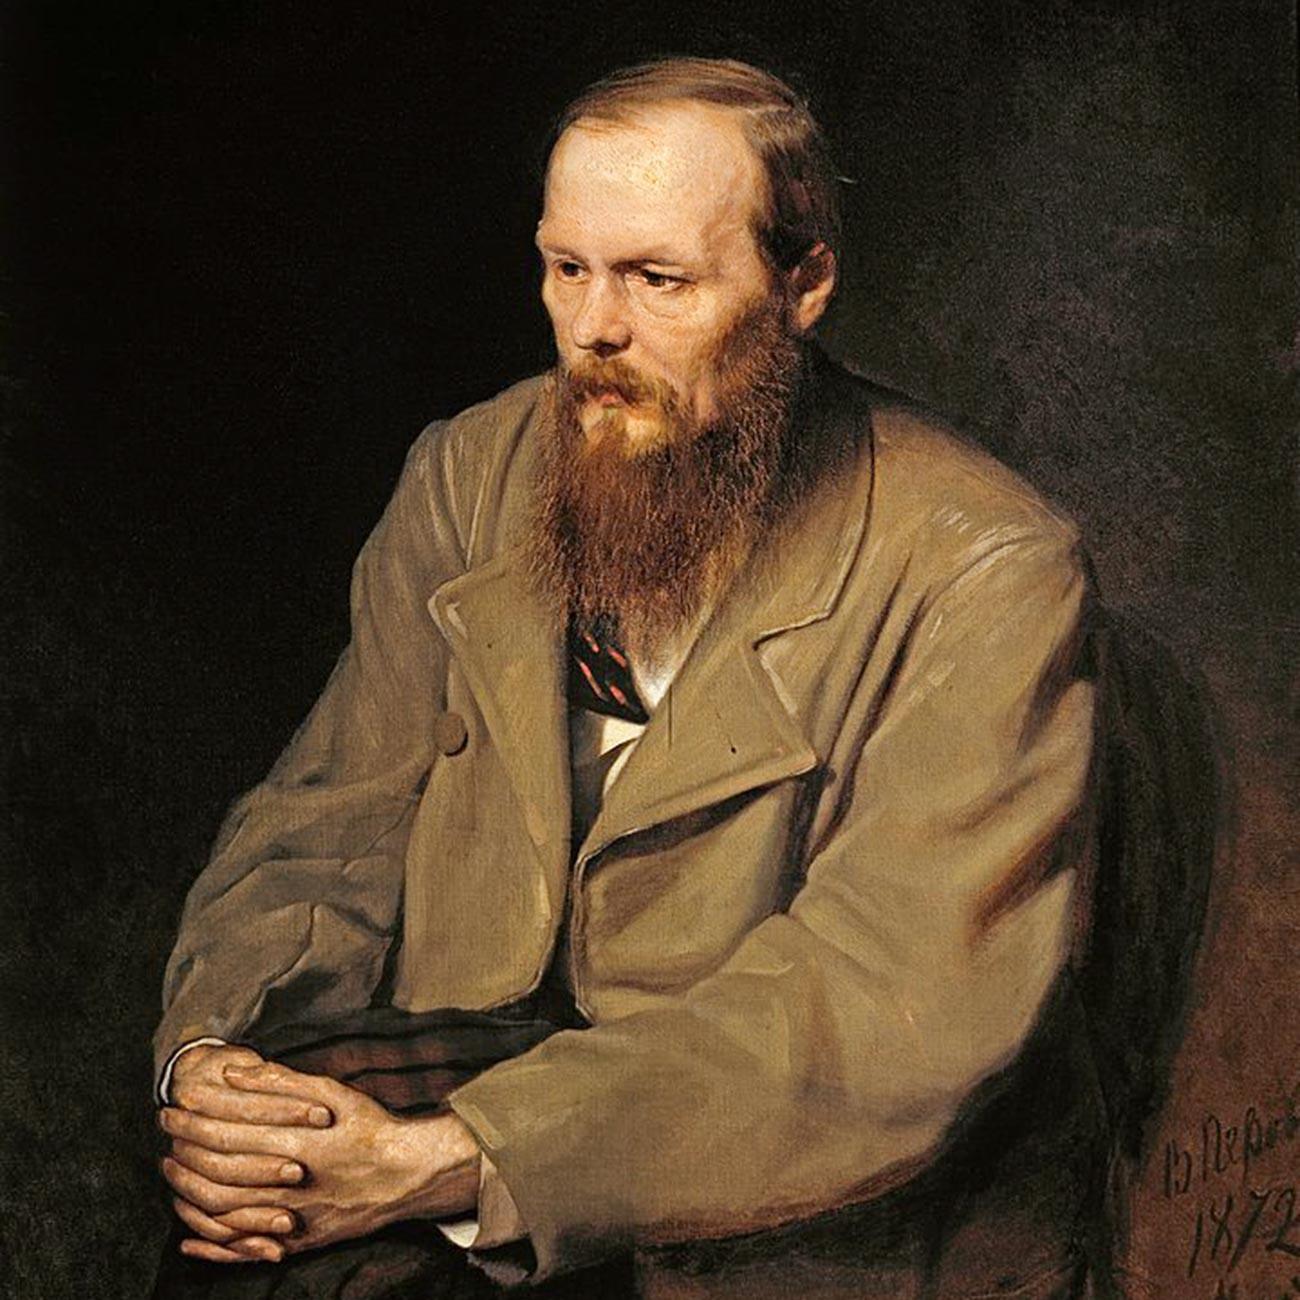 A portrait of Fyodor Dostoyevsky.